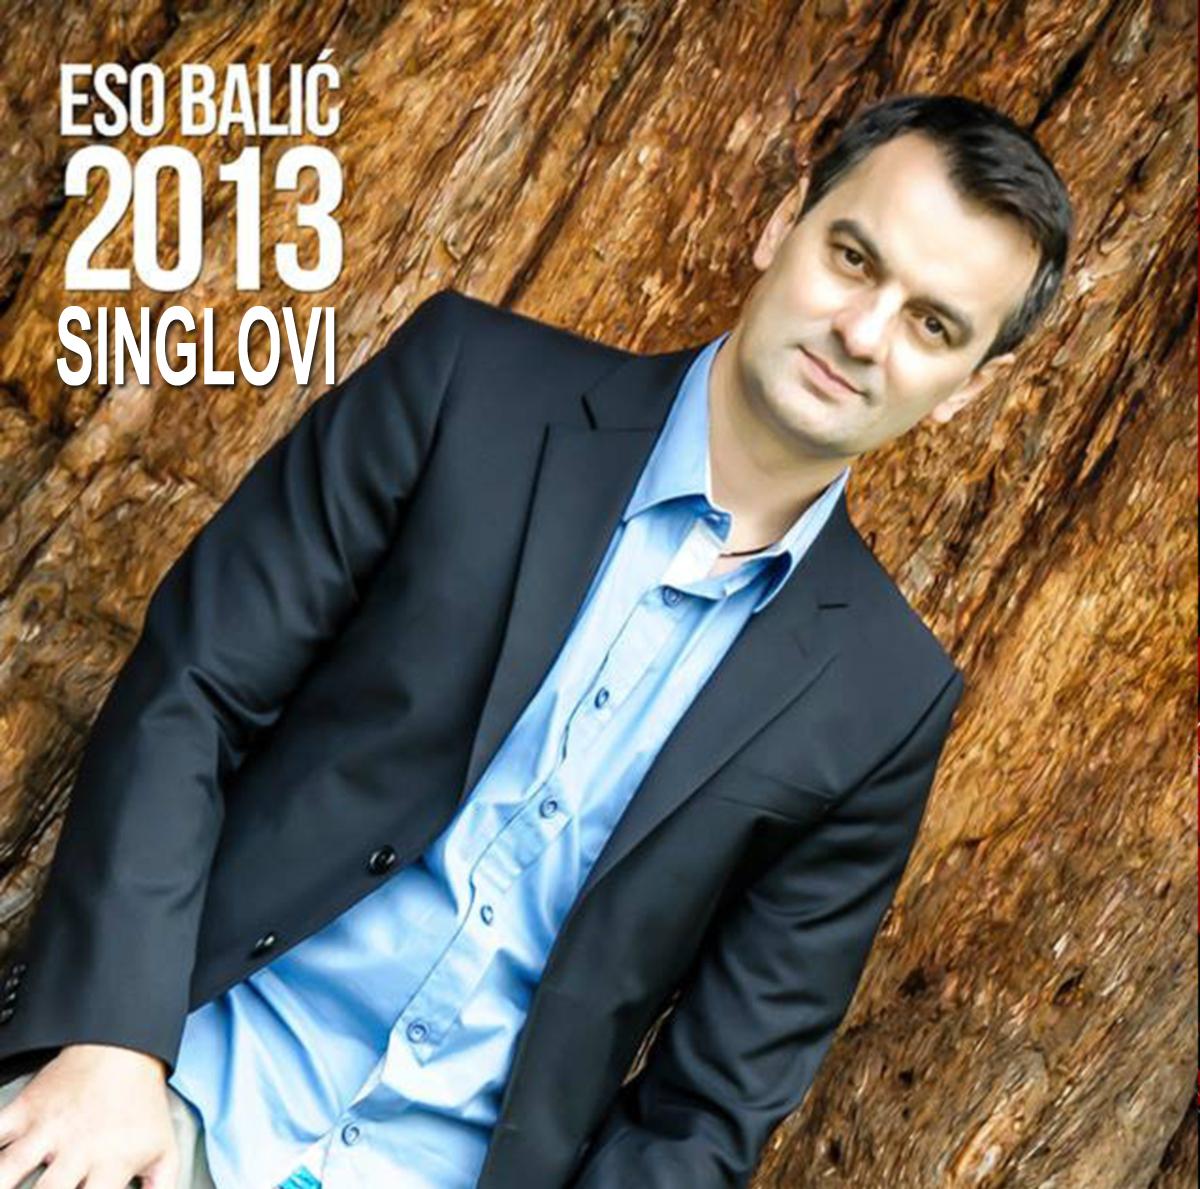 Eso Balic - Diskografija (1997-2013)  2013-Singlovi